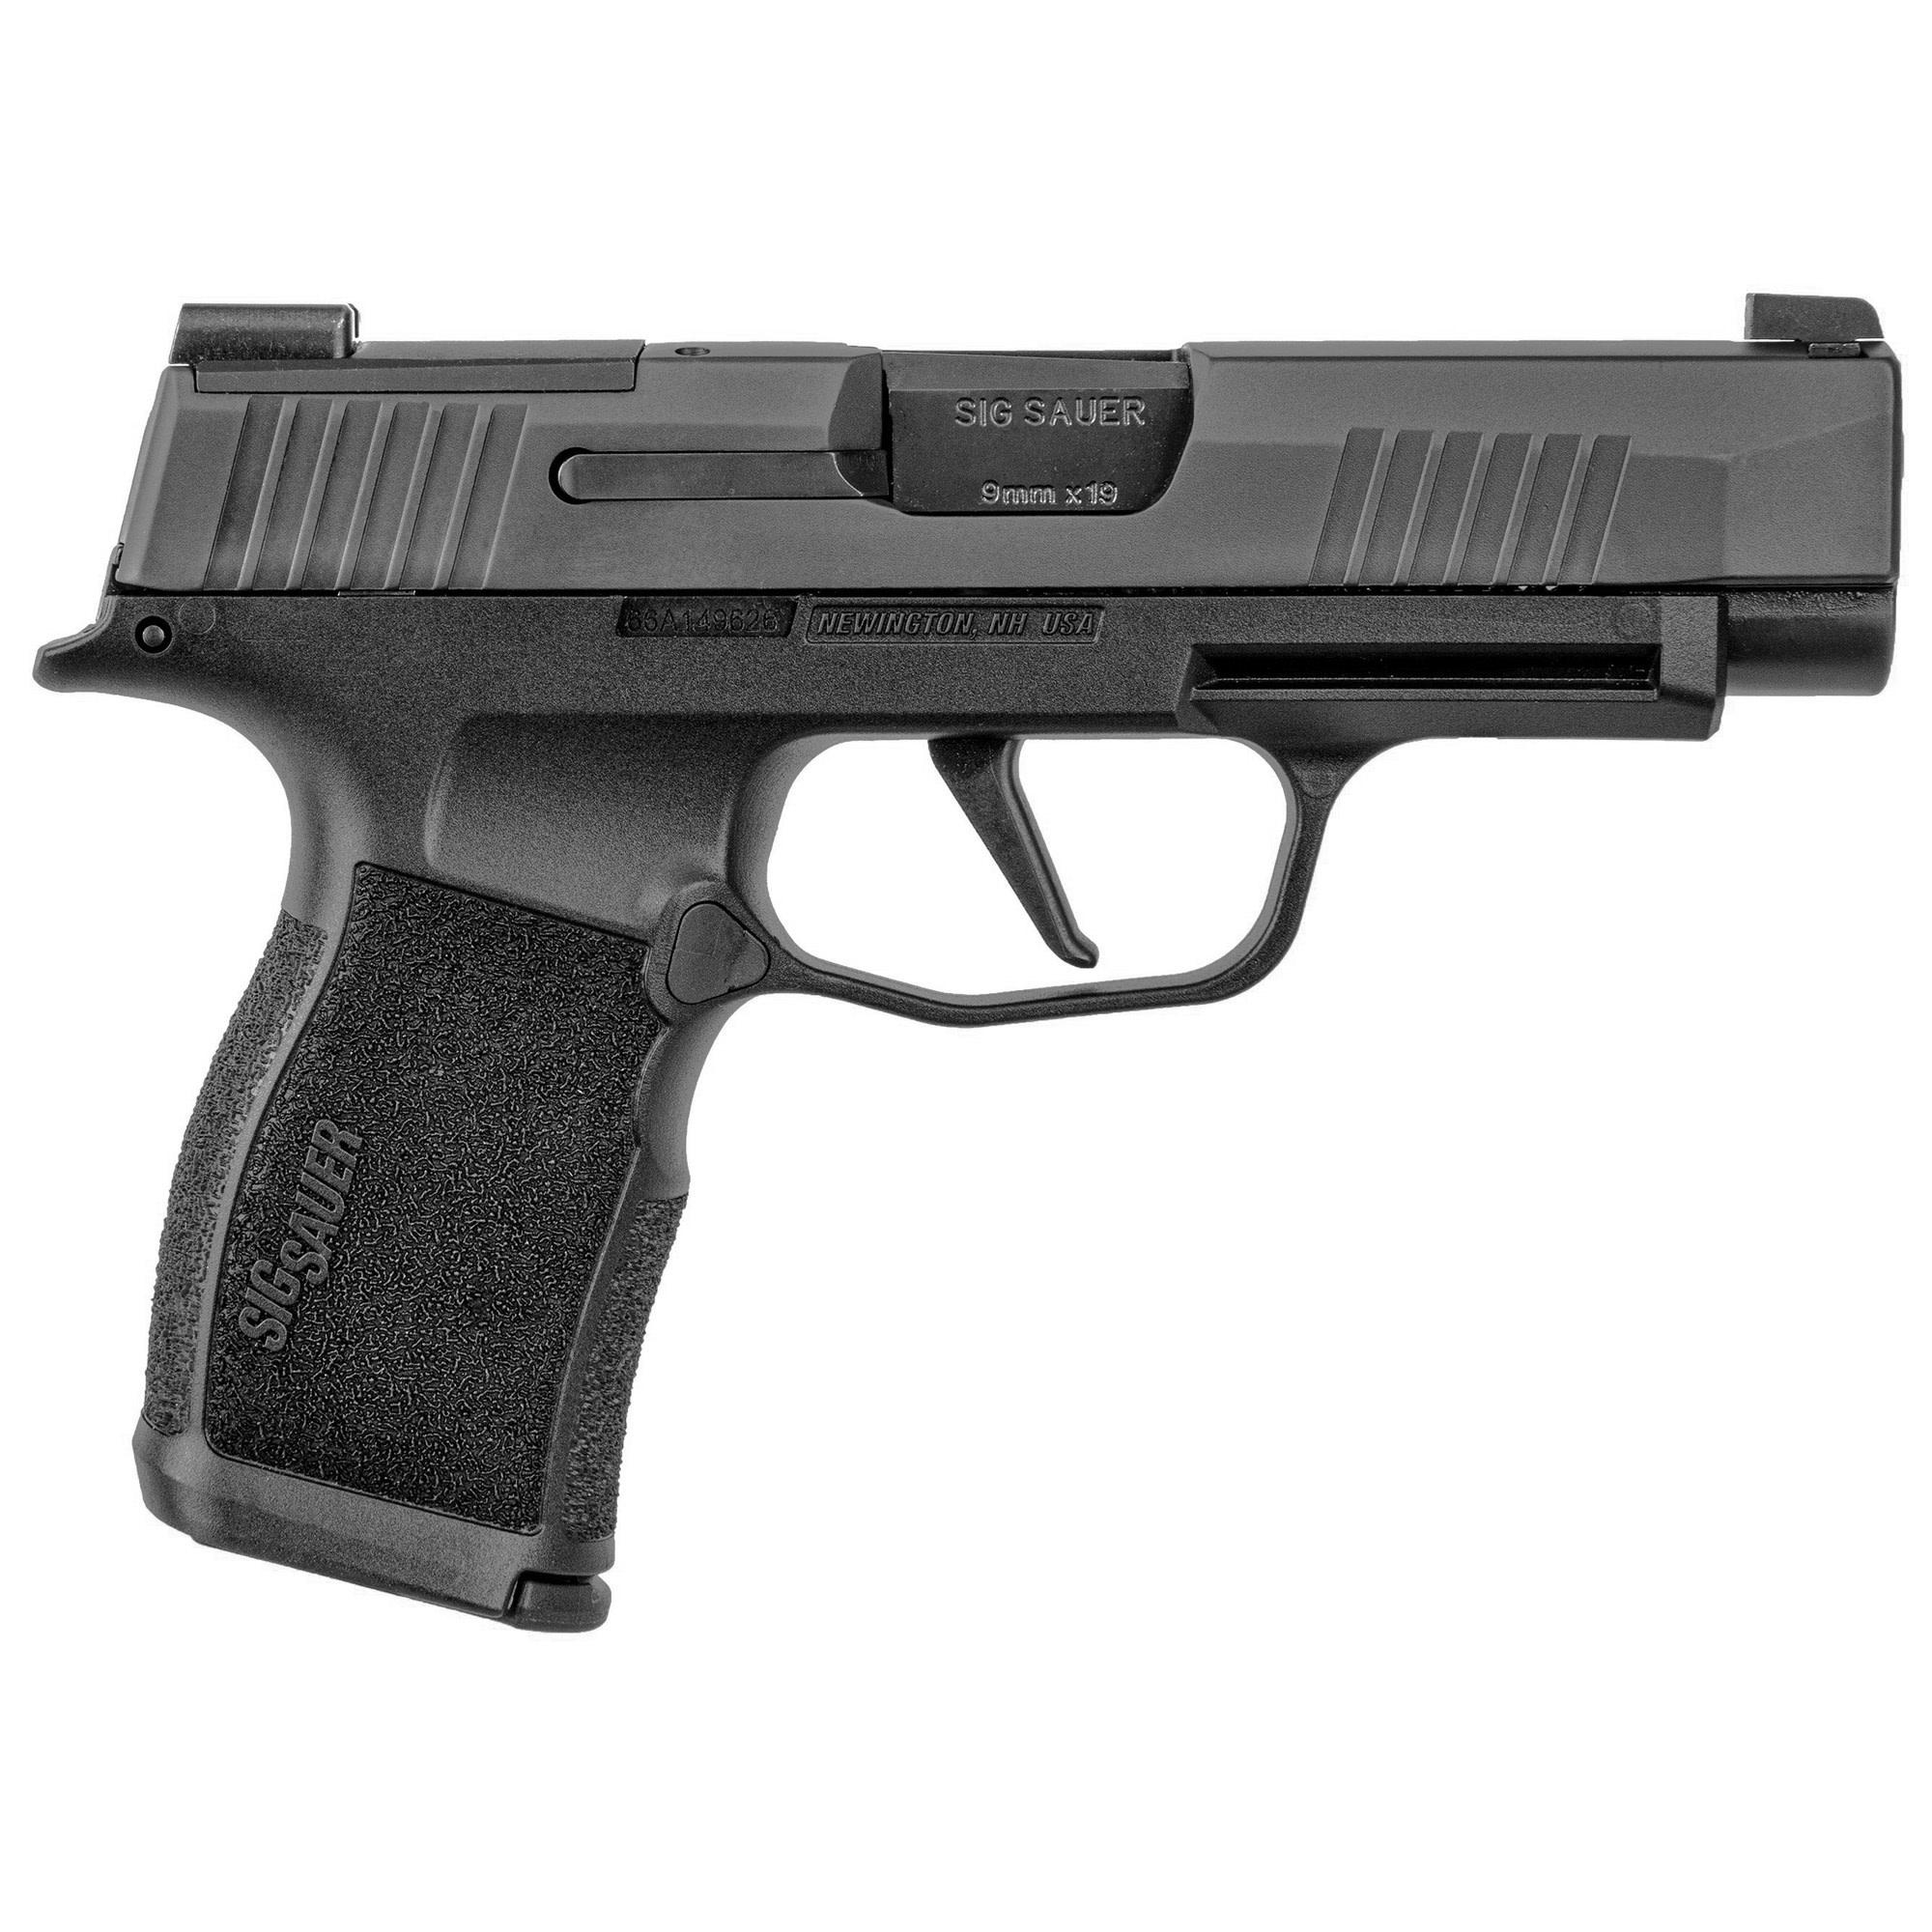 Sig Sauer P365XL, 9mm, Night Sights, 12rd, X Series Flat trigger